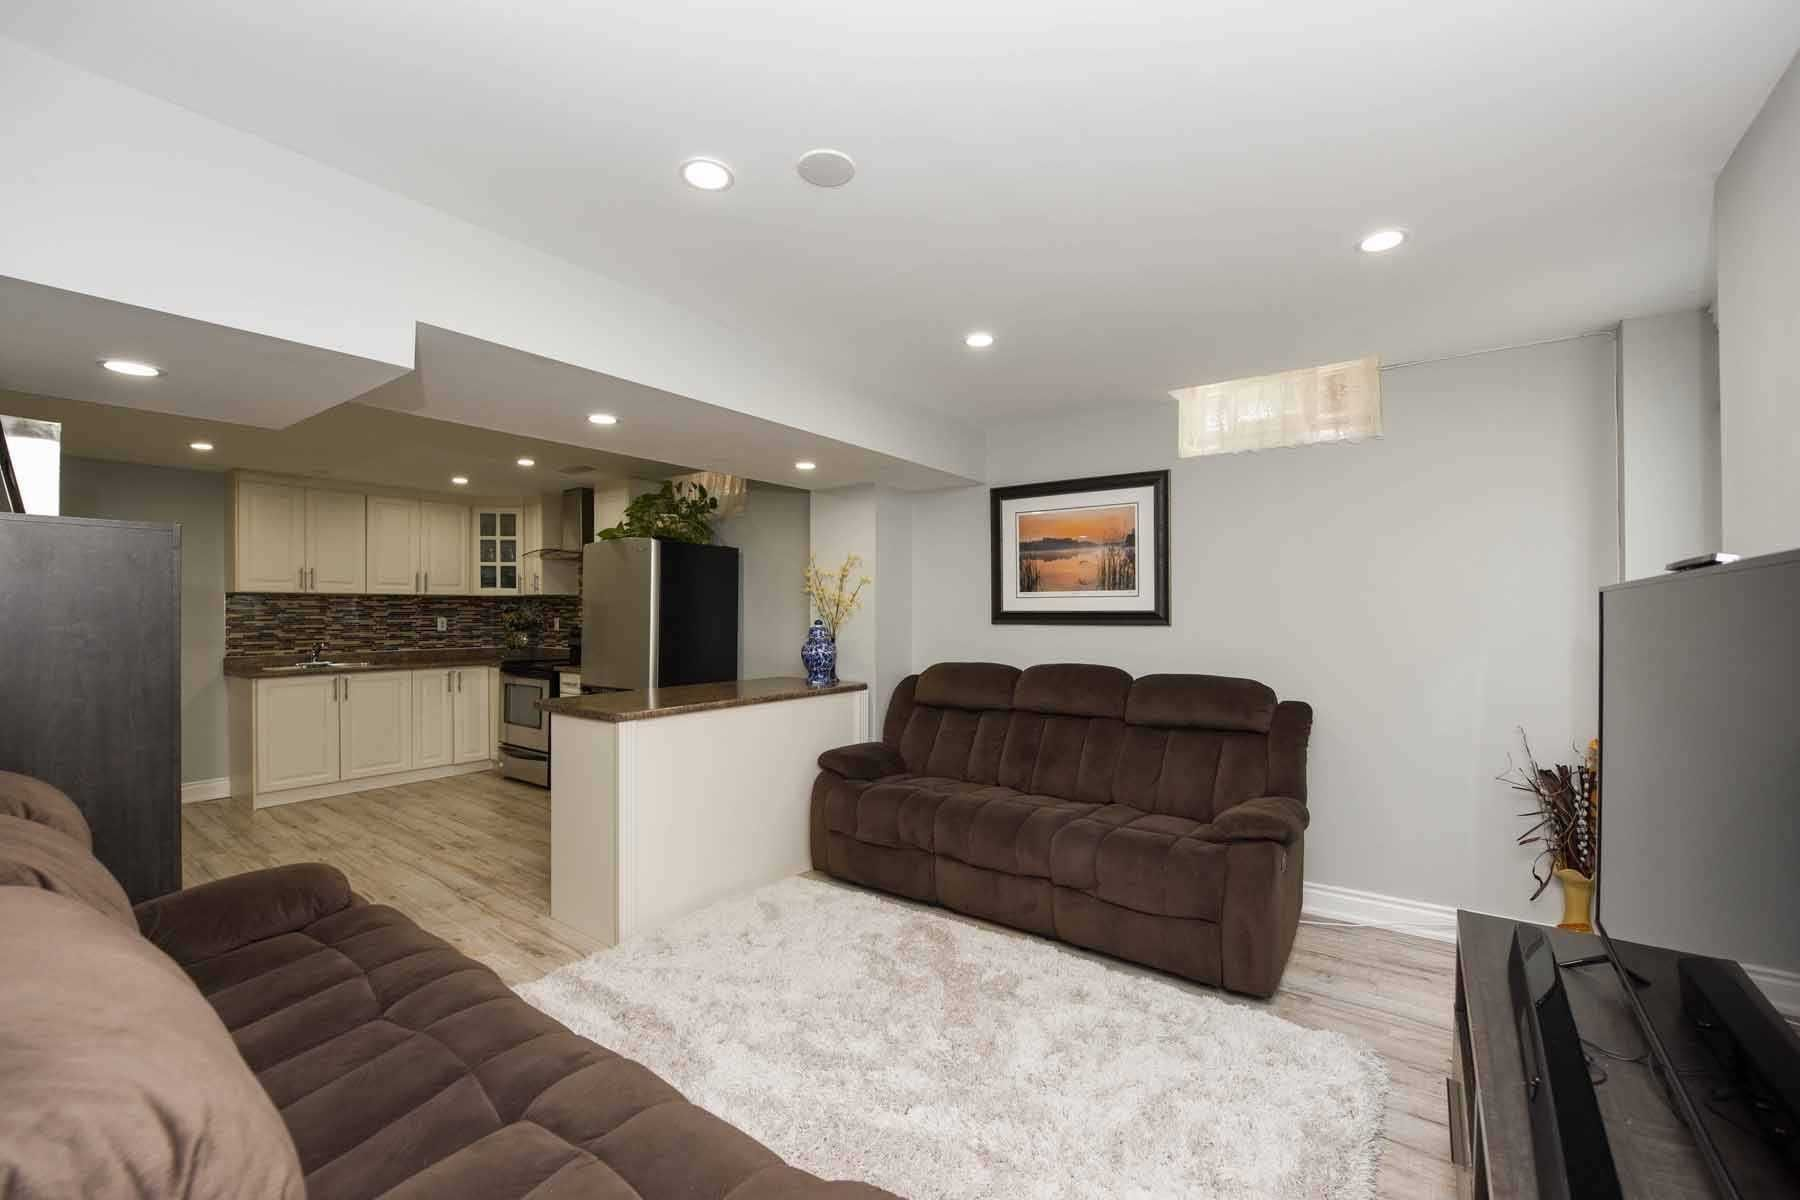 Photo 4: Photos: 20 Hallen Road in Brampton: Fletcher's West House (Apartment) for lease : MLS®# W5074220